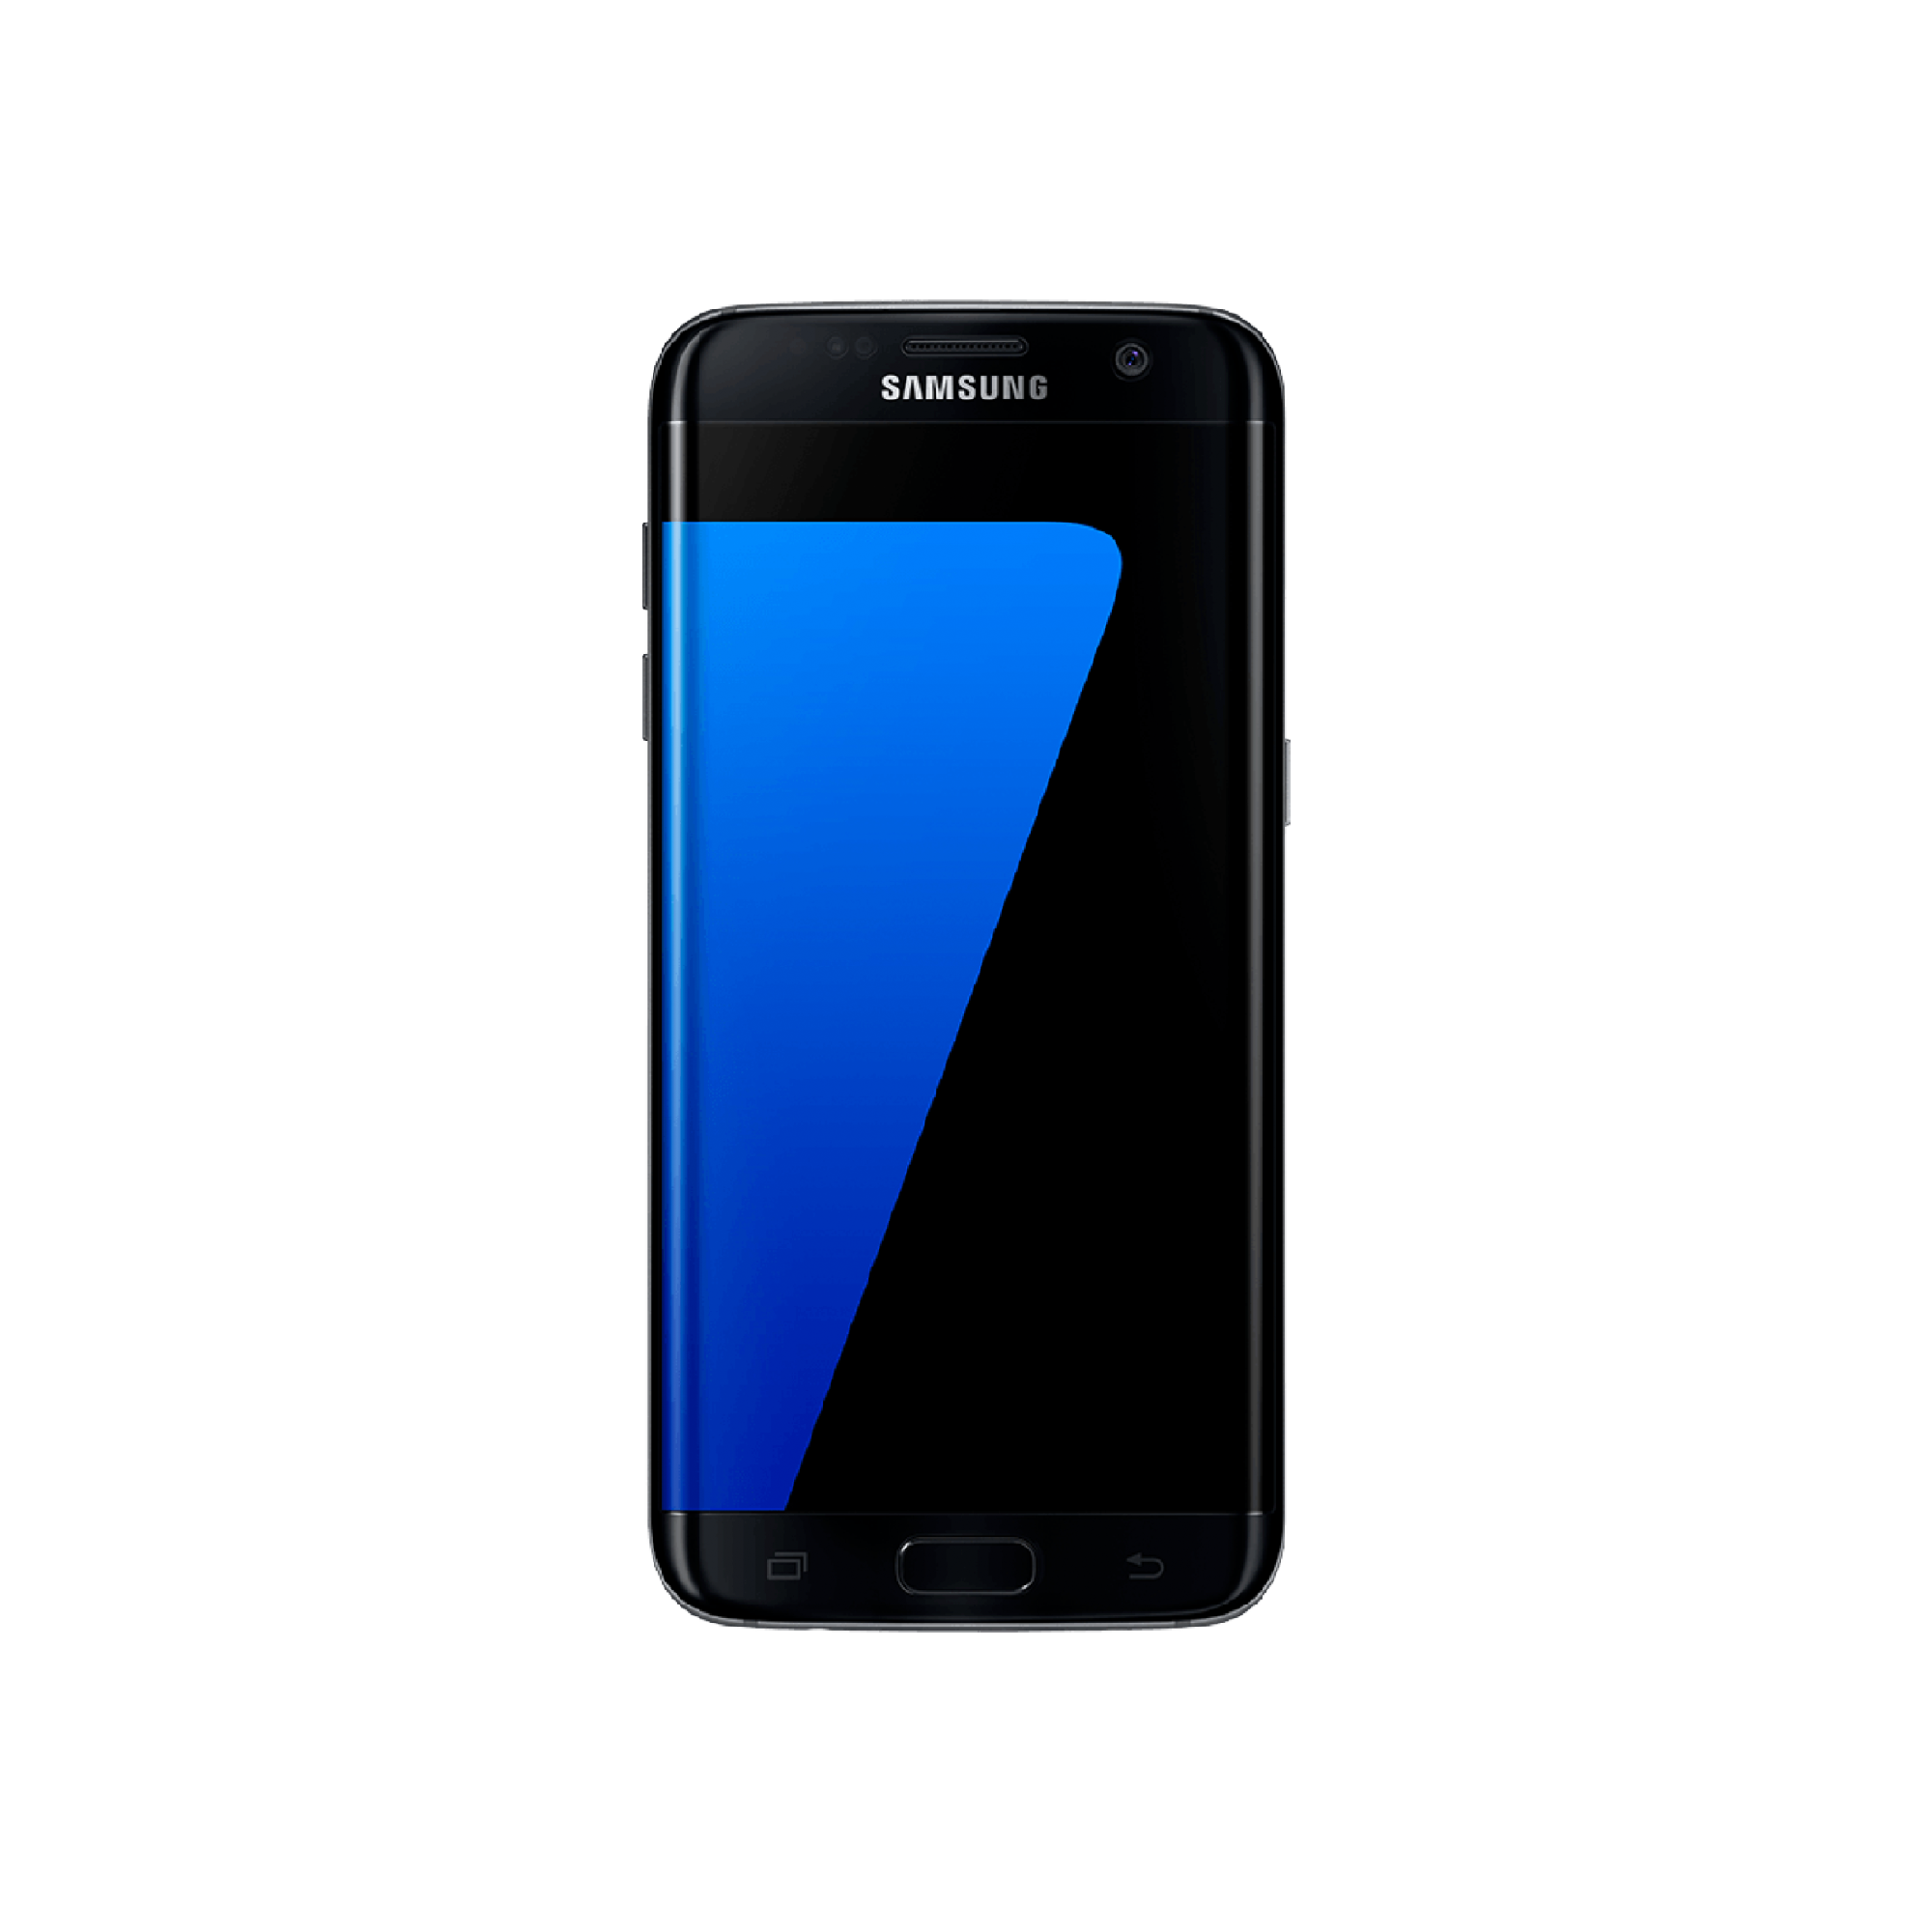 Samsung S7 Edge | $259 + tax